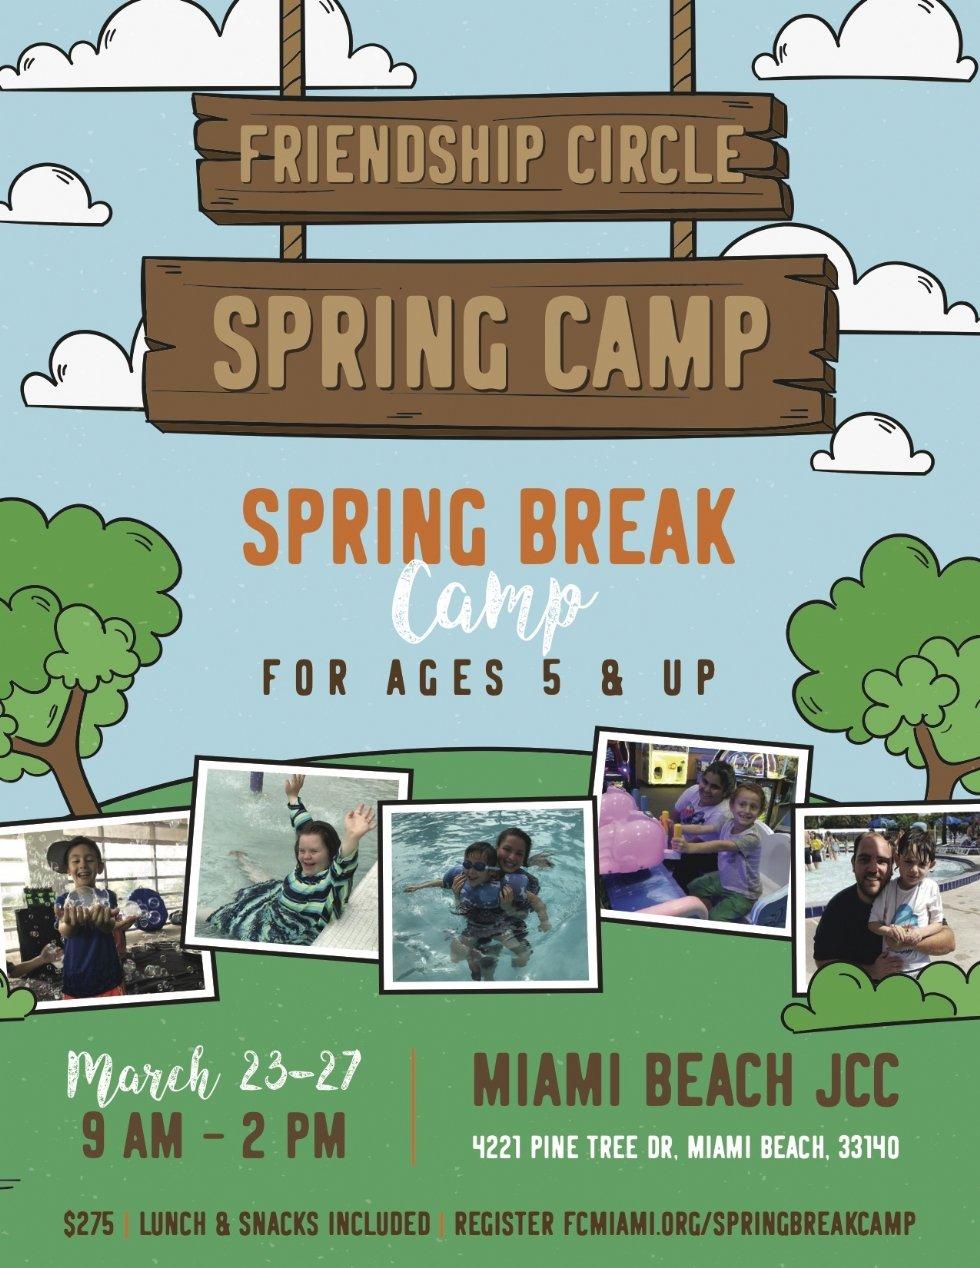 Spring Break Camp flyer.jpg